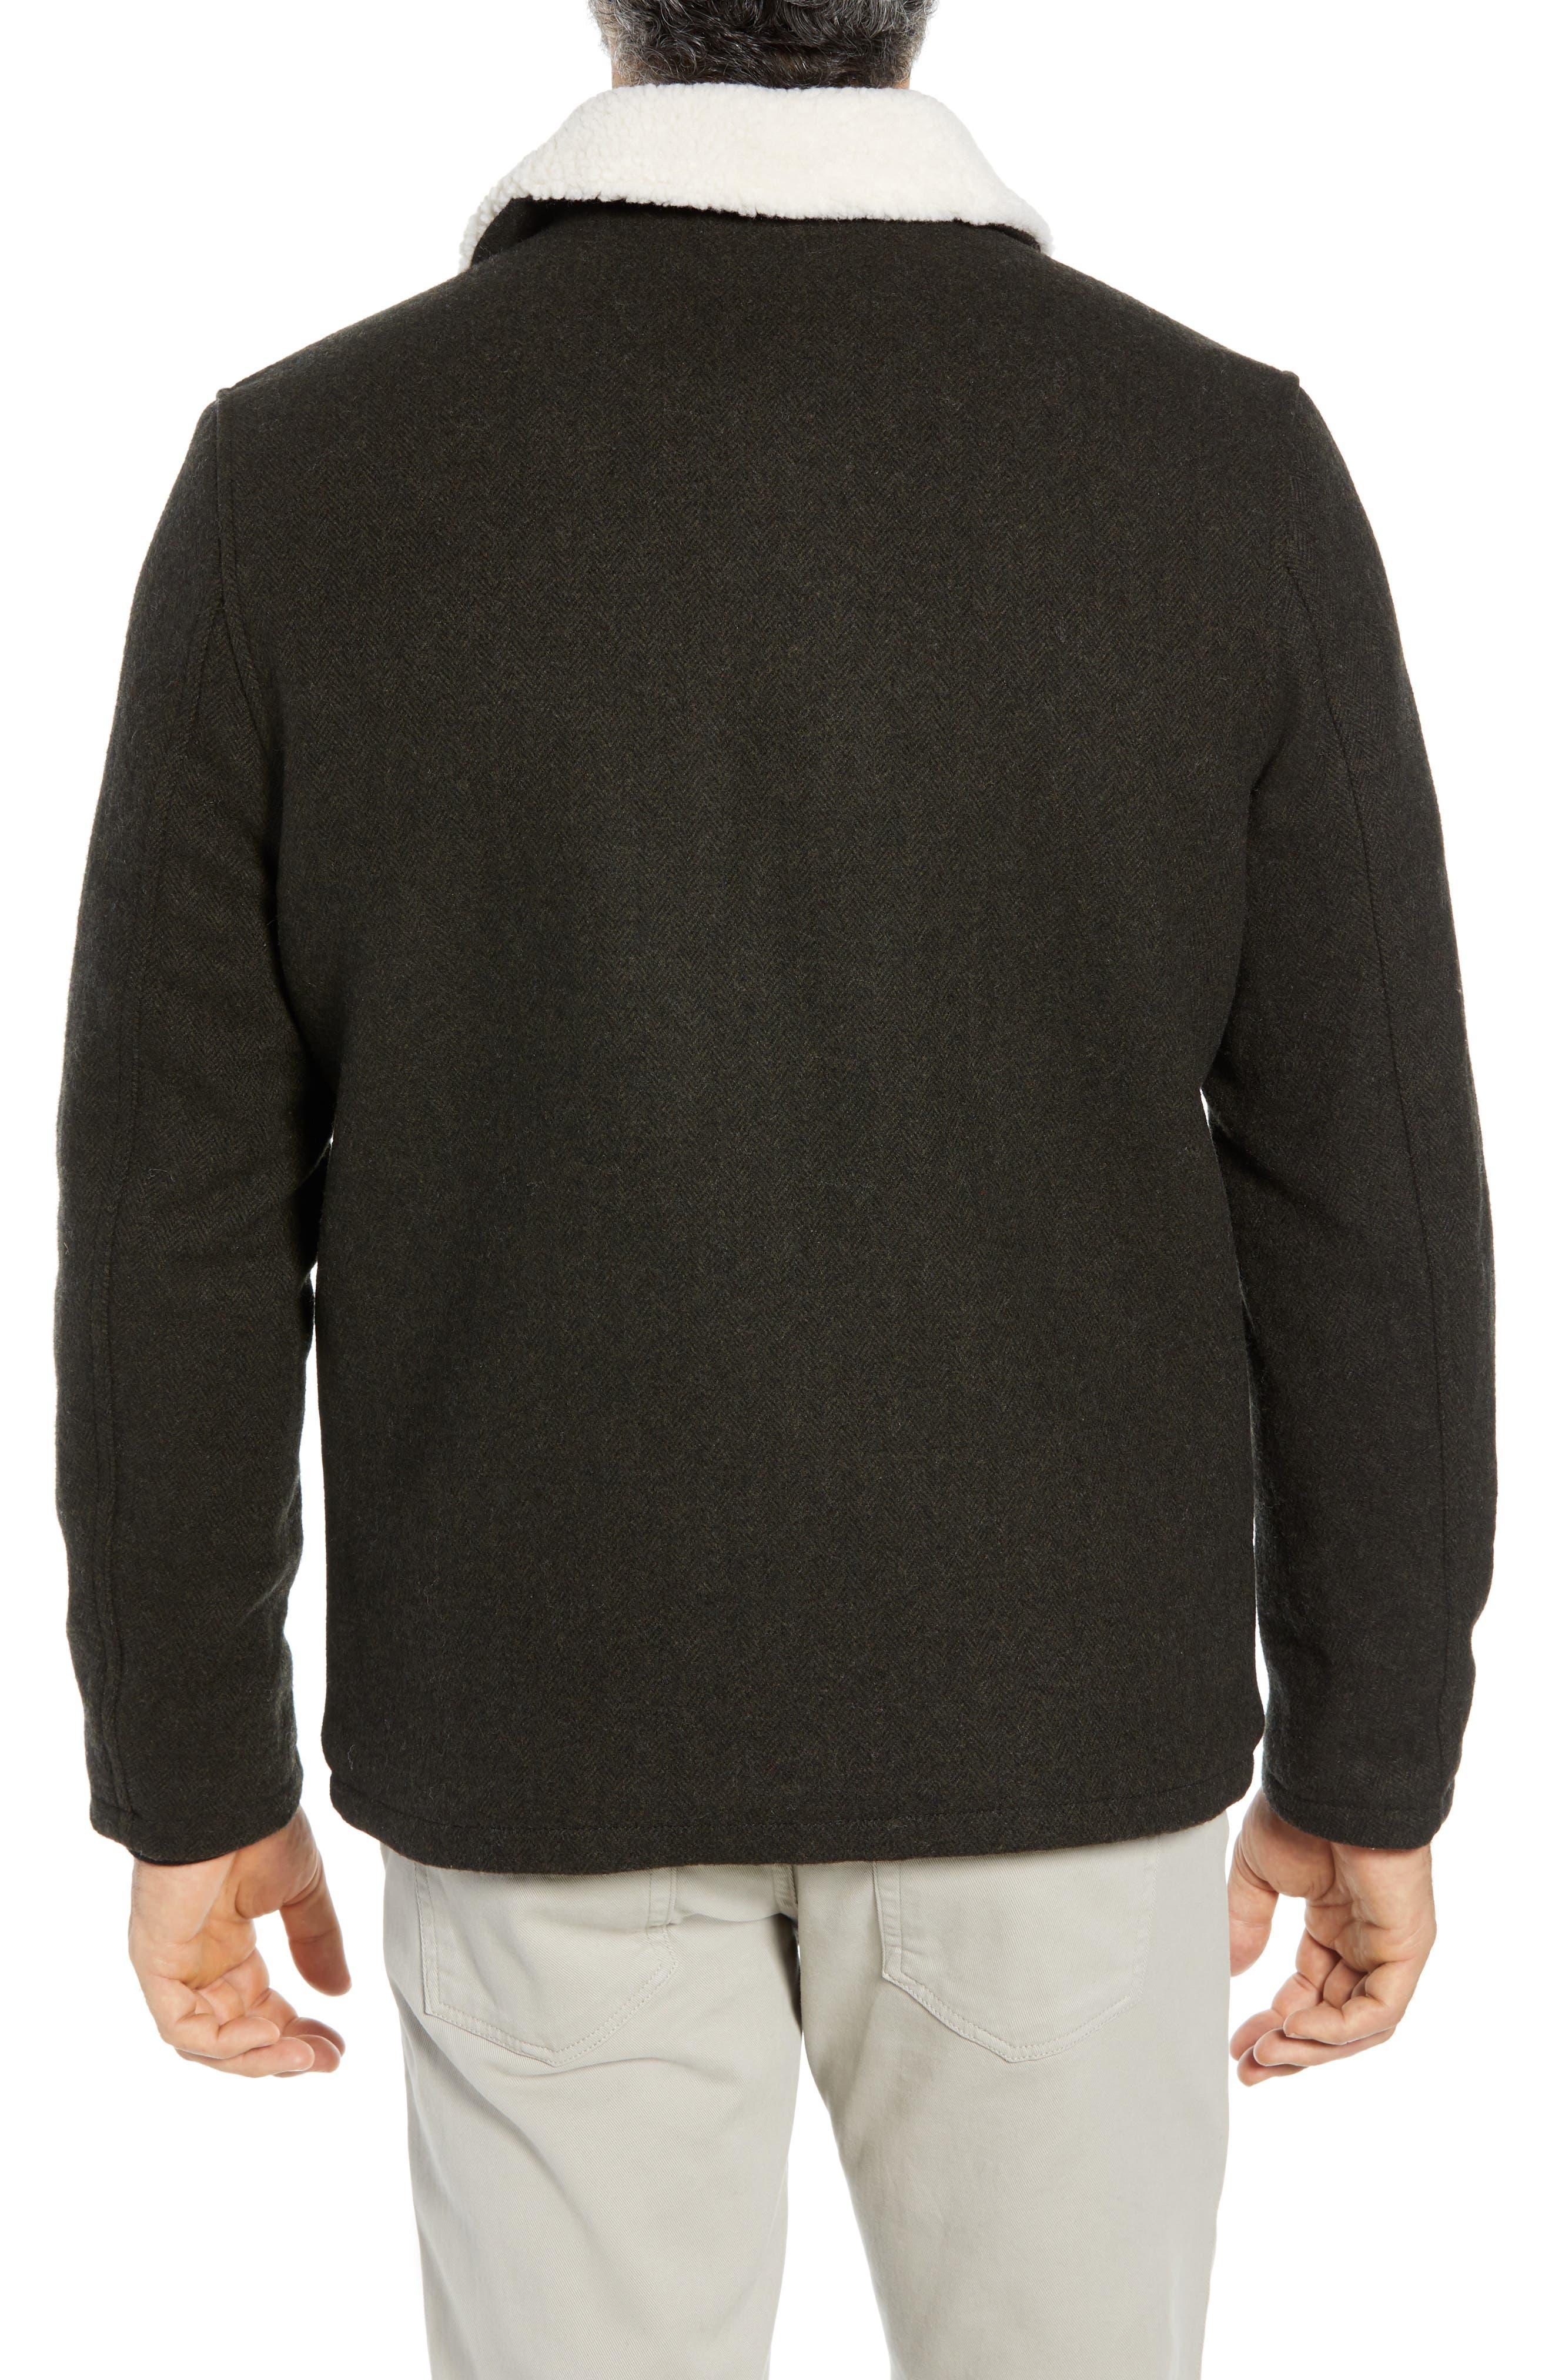 COLE HAAN SIGNATURE,                             Faux Shearling Trim Field Jacket,                             Alternate thumbnail 2, color,                             317